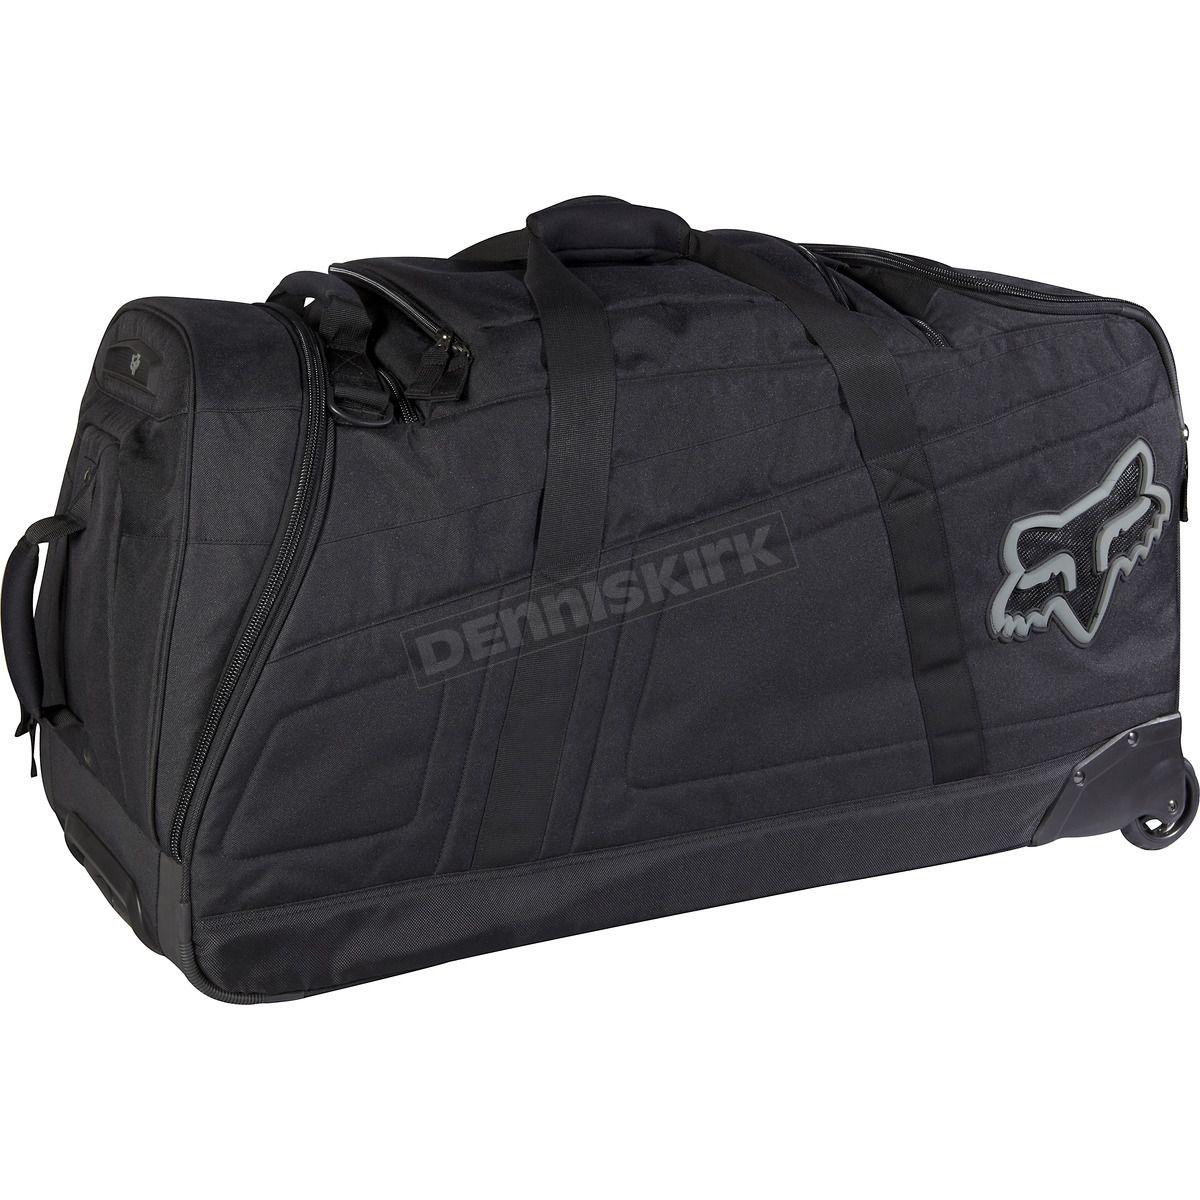 Fox Motocrosser Fox Shuttle Gear Bag 11060 001 Os Atv Dirt Bike Motocross Gear Bag Dirt Bike Riding Gear Gear Bag